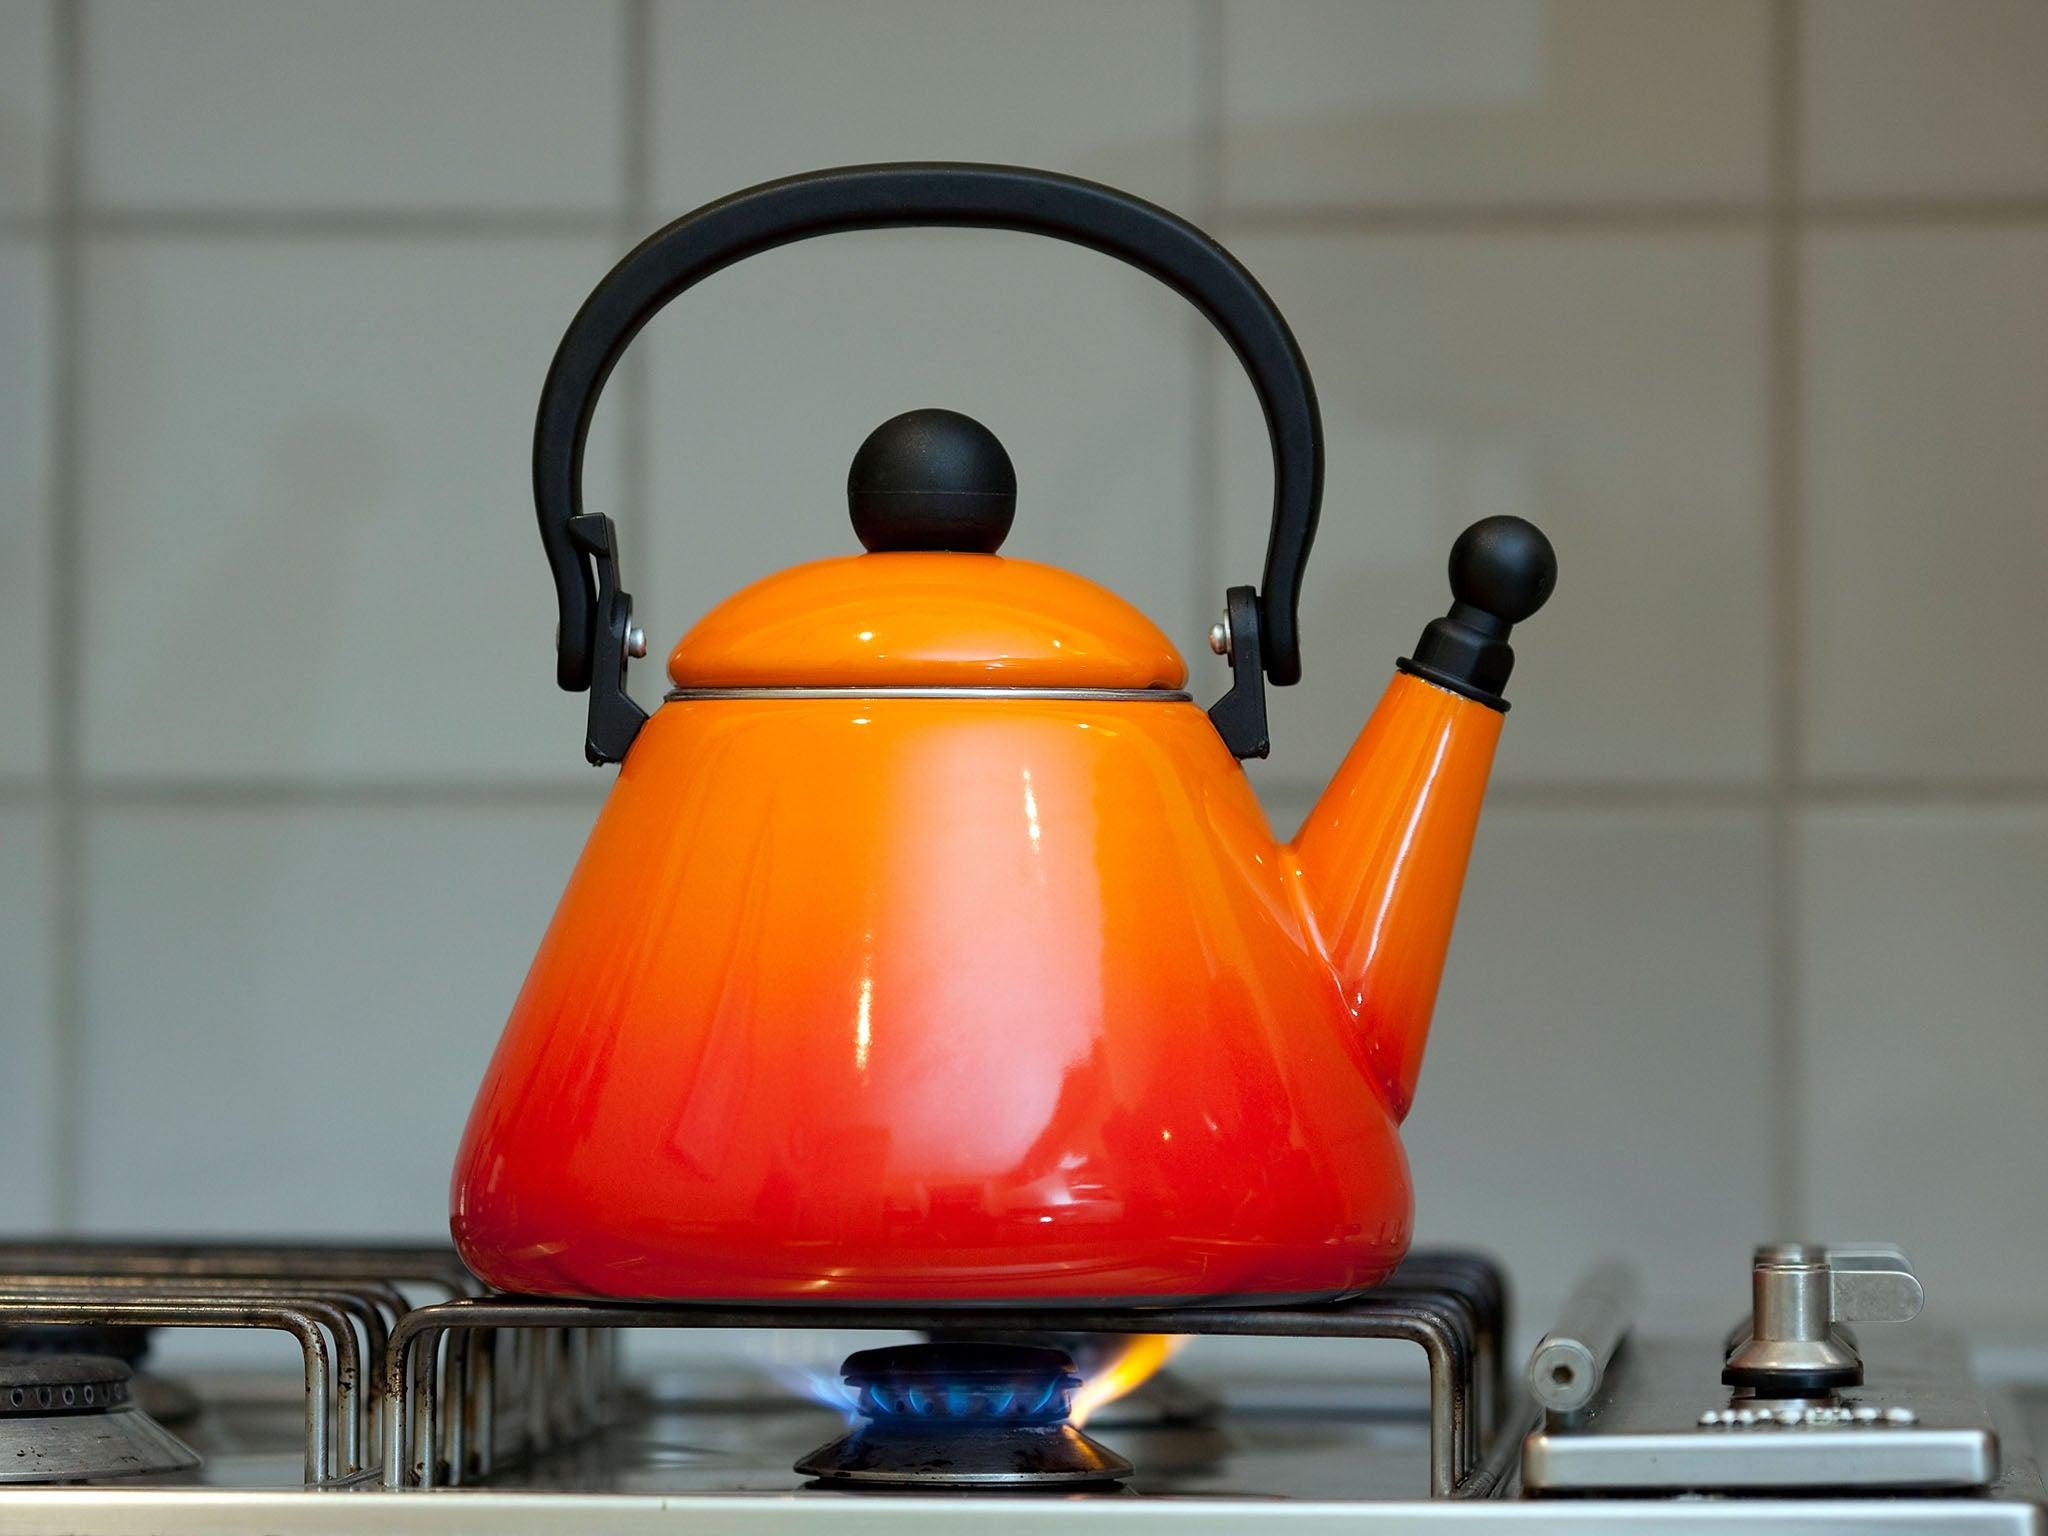 Boiling kettle • Science Happens